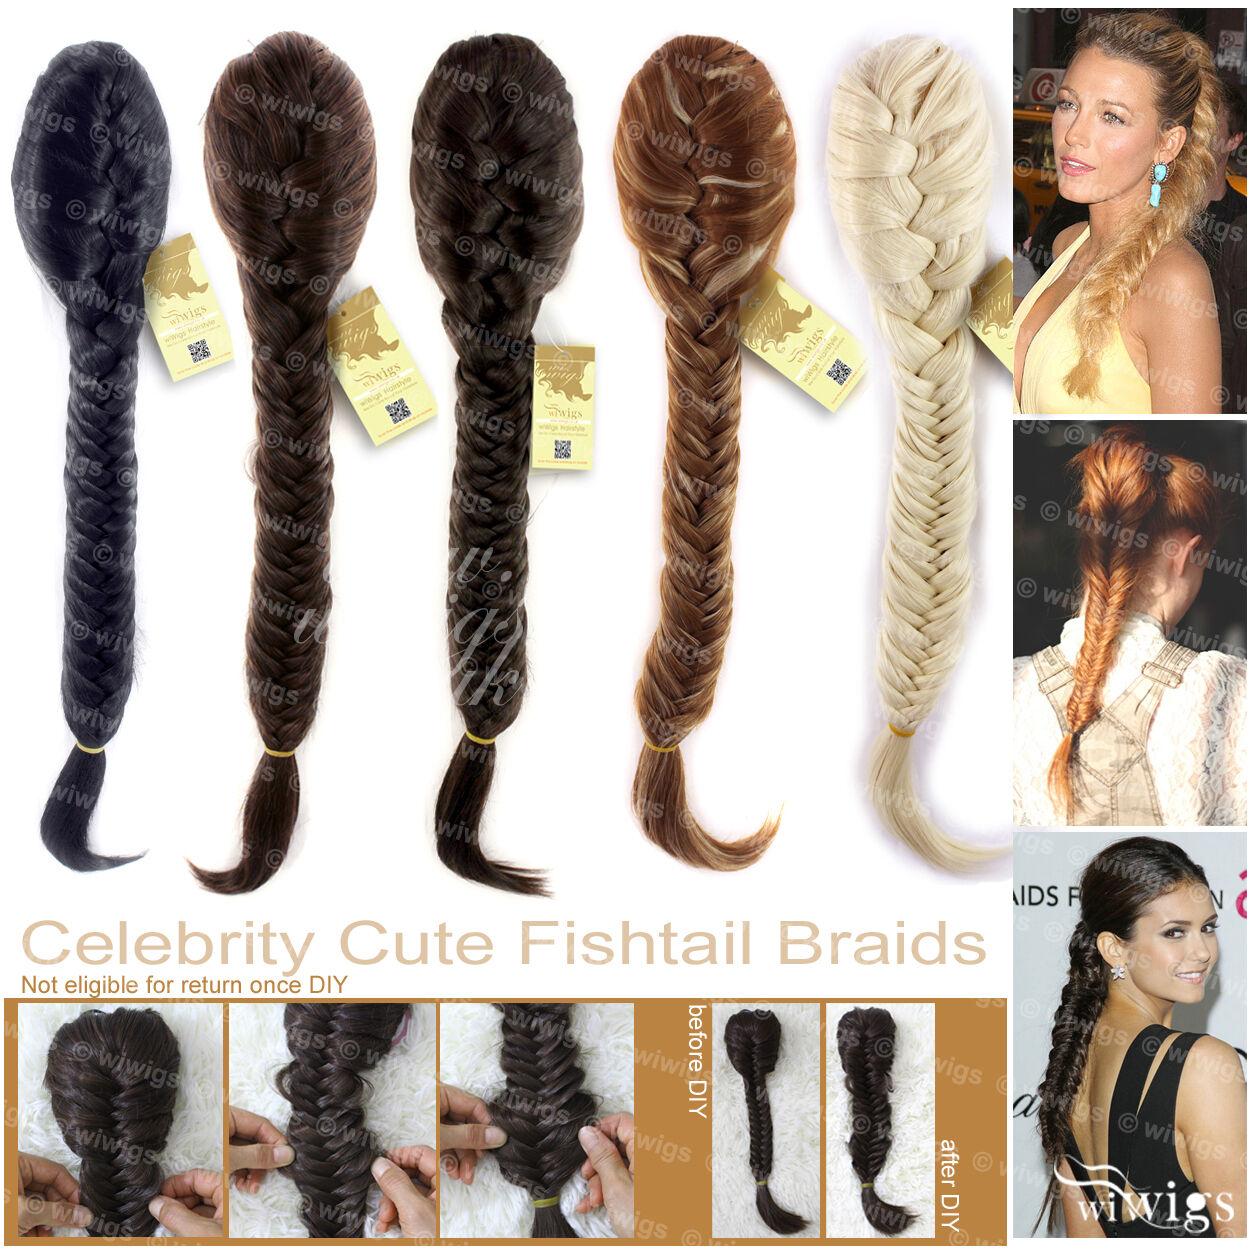 Wiwigs Celebrity Clip In Fishtail Plait Braids Ponytail